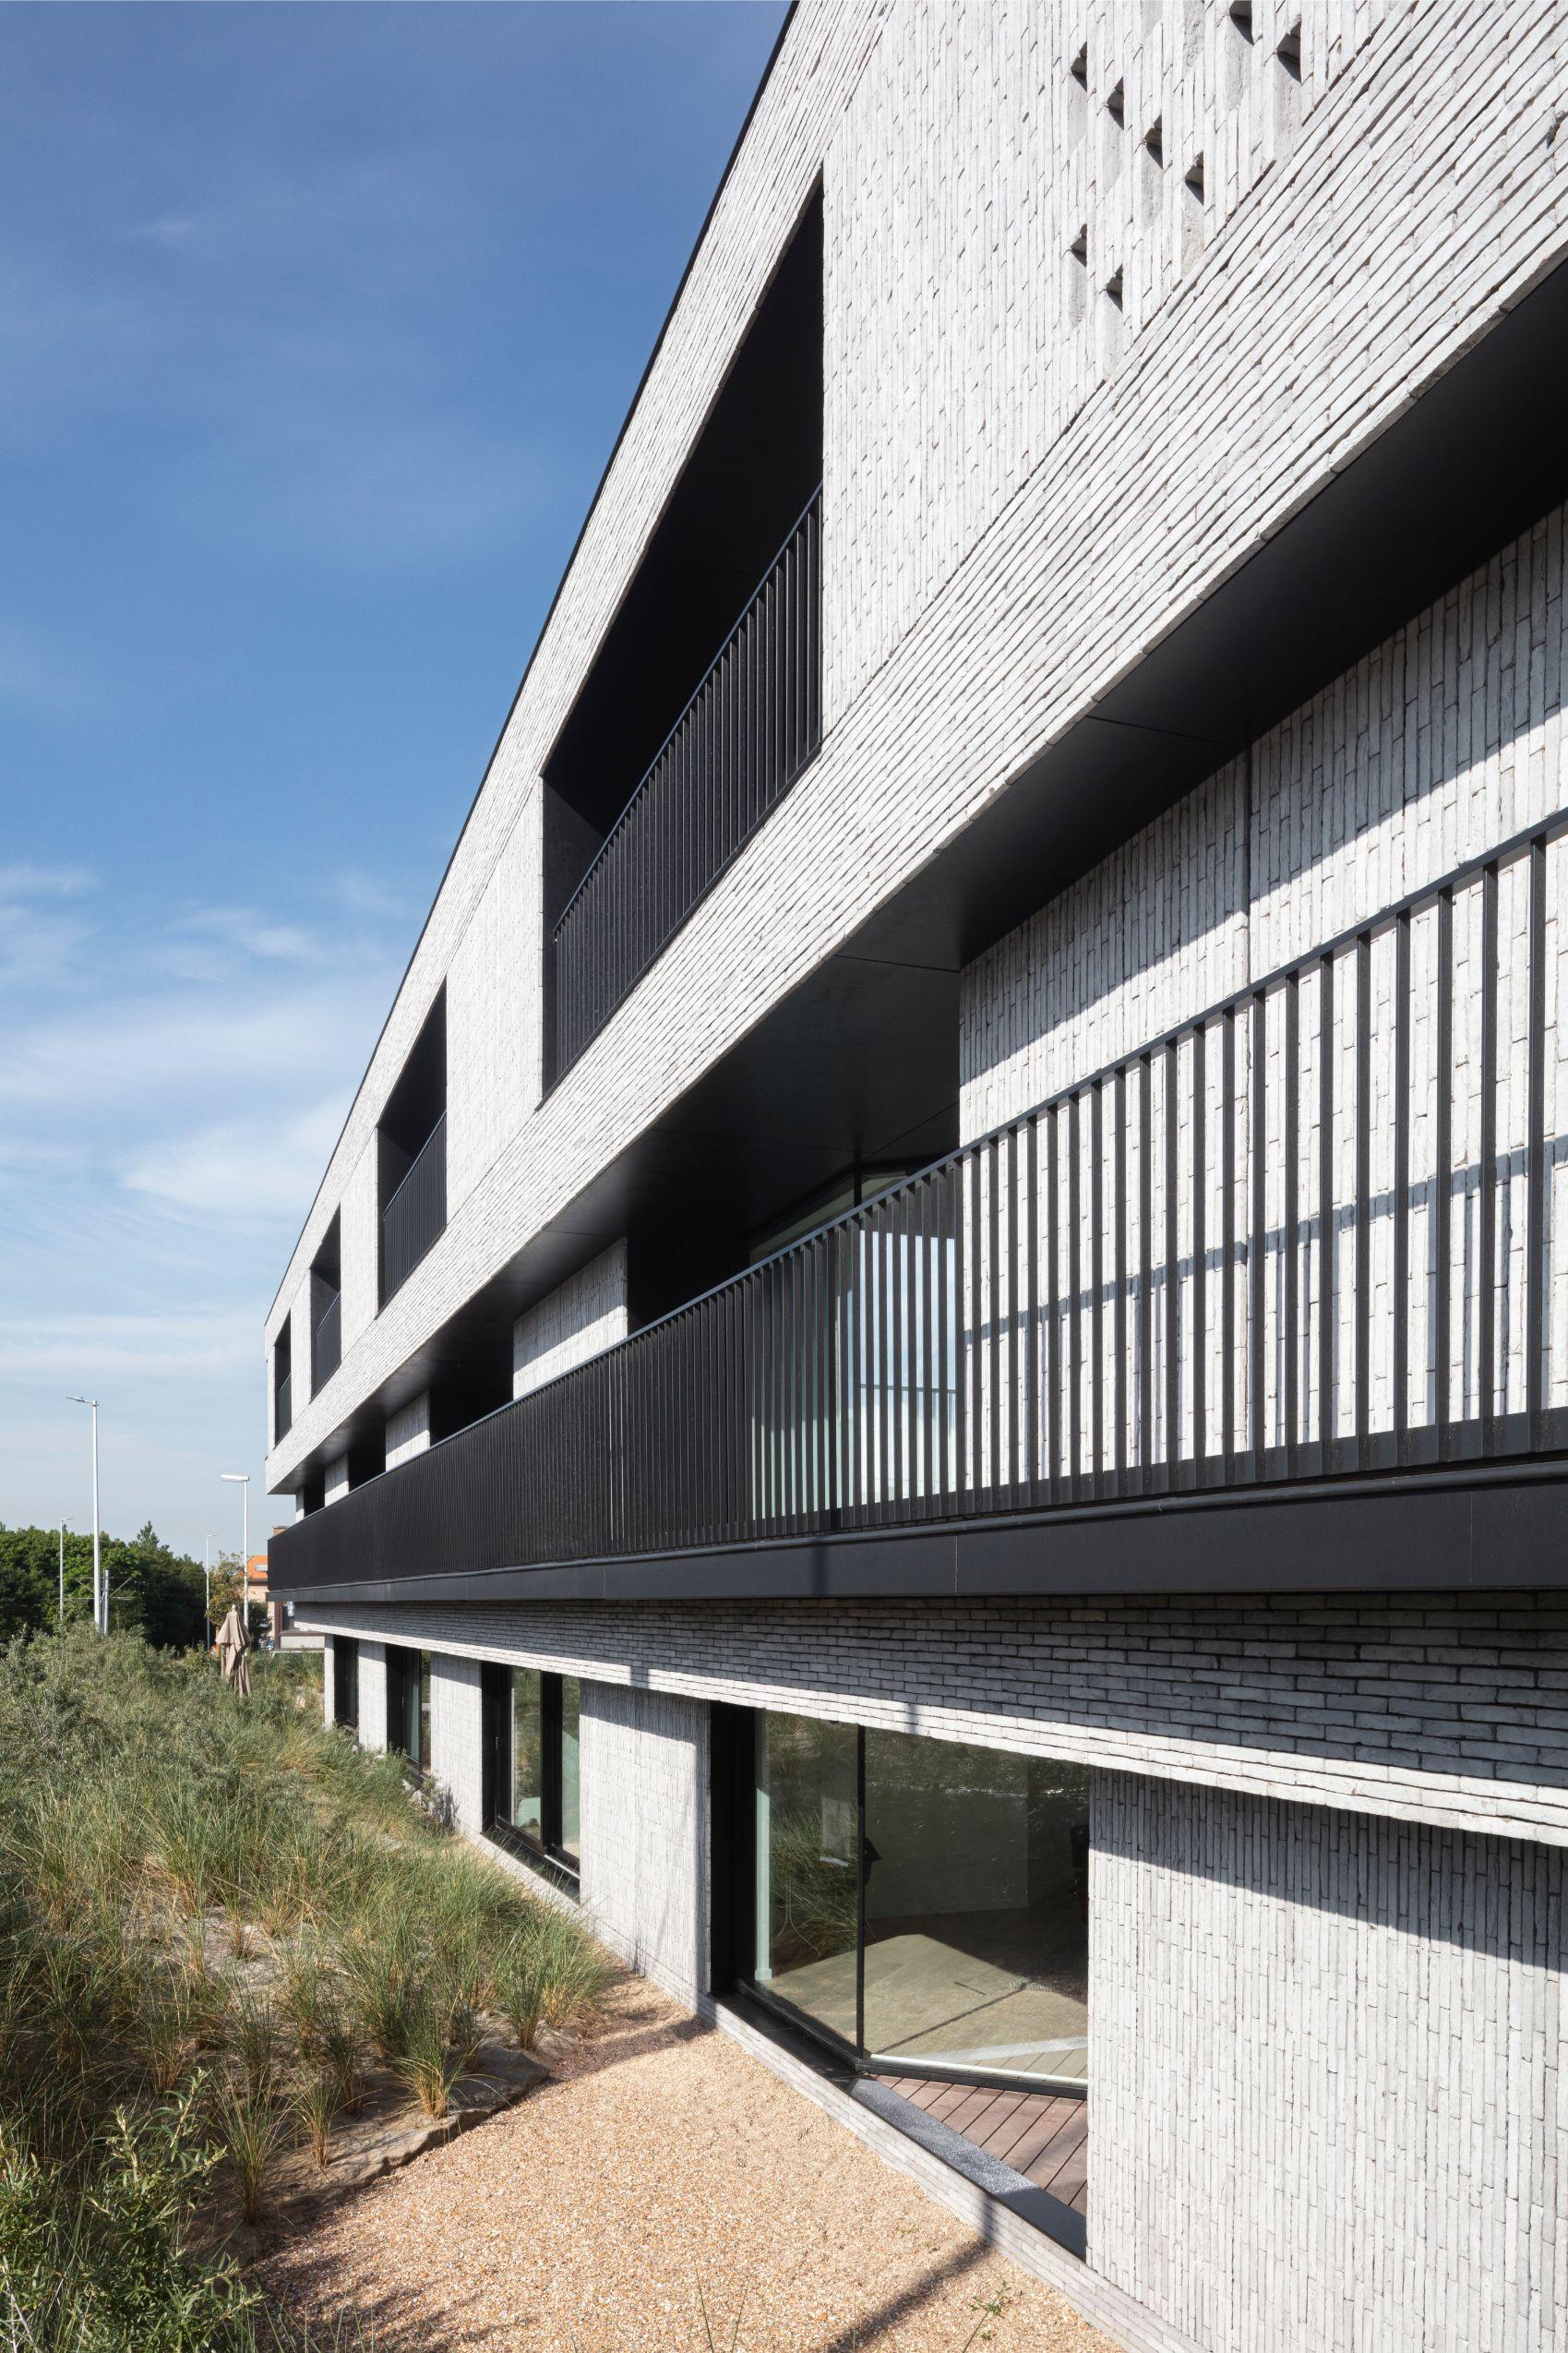 Pierre Paulin - Rietveldprojects - Sint-Idesbald - Tvdv6.jpg